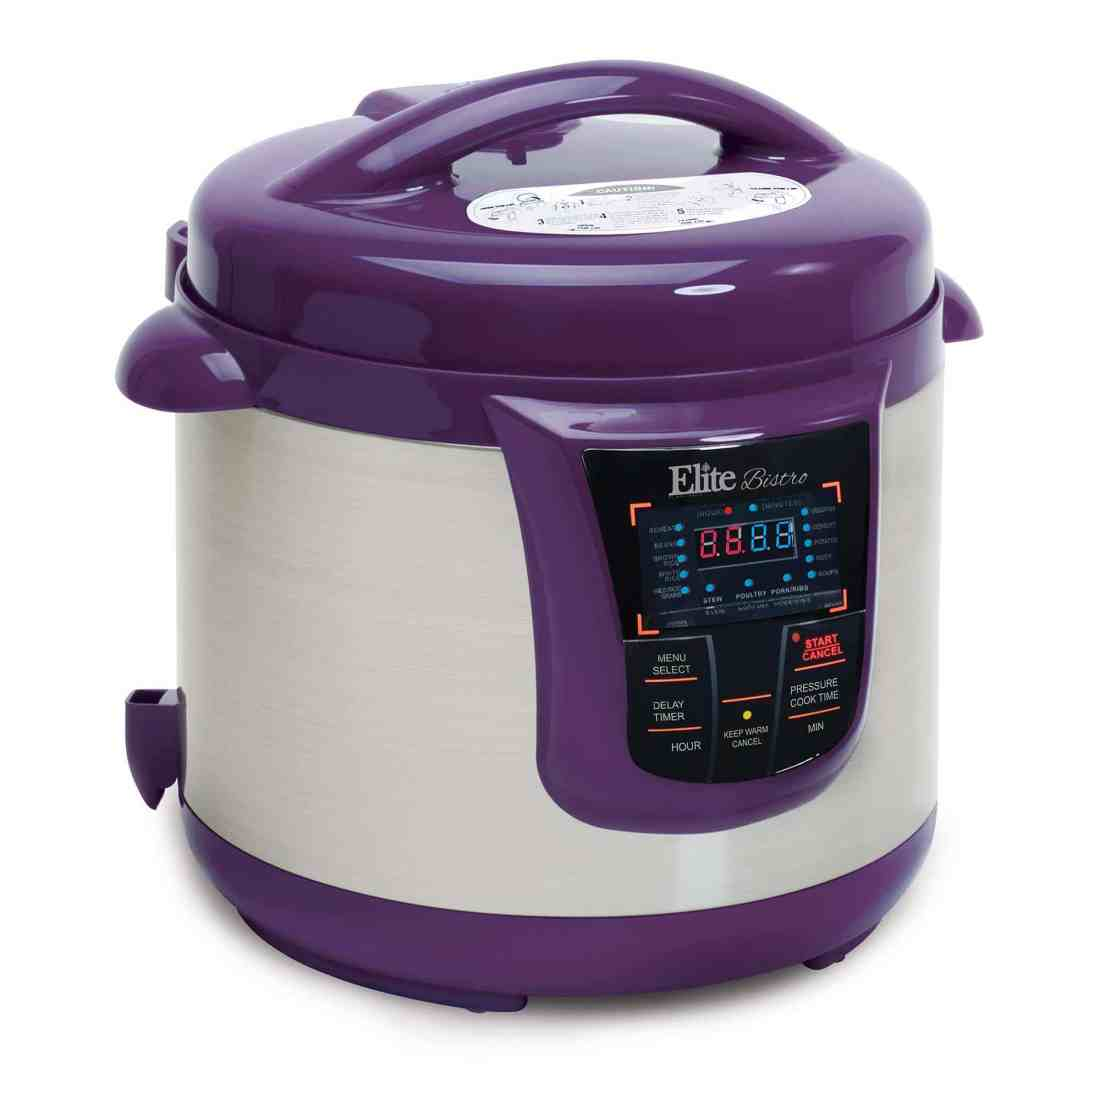 elite bistro pressure cooker lawsuit